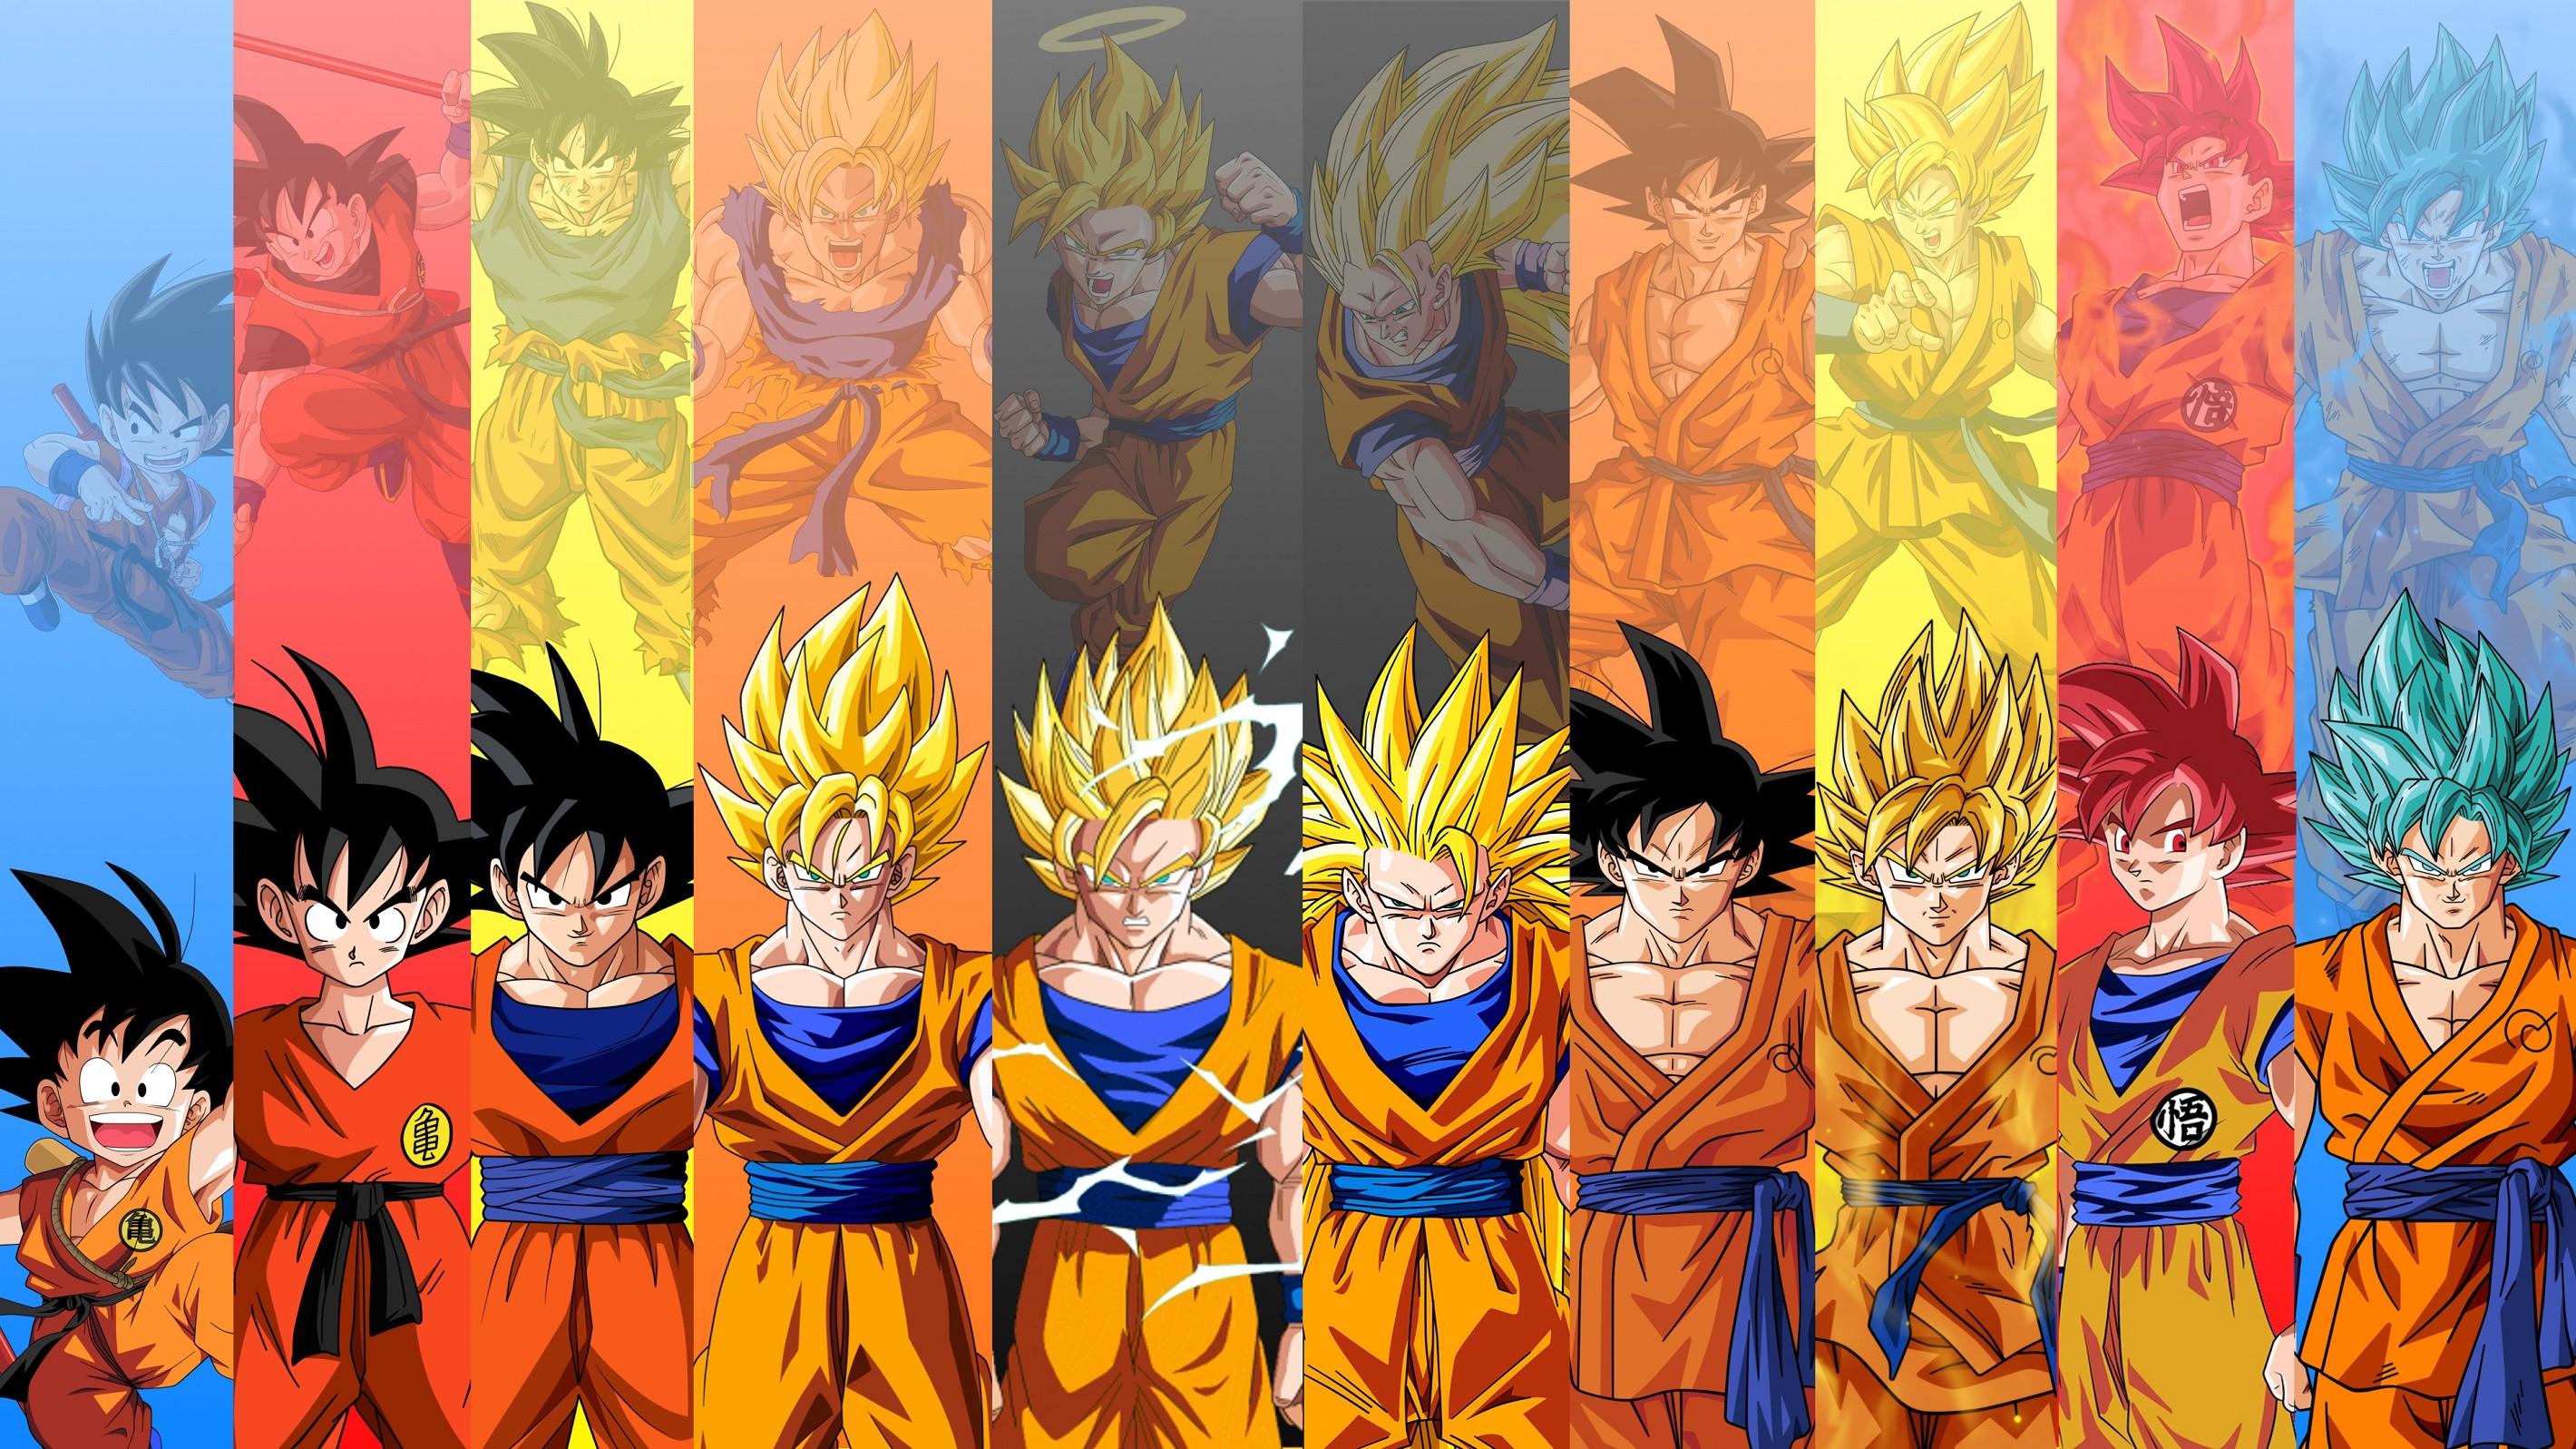 Anime Dragon Ball Super Goku Super Saiyan 3 Wallpaper | Dragon Ball |  Pinterest | Goku, Dragon ball and Goku super